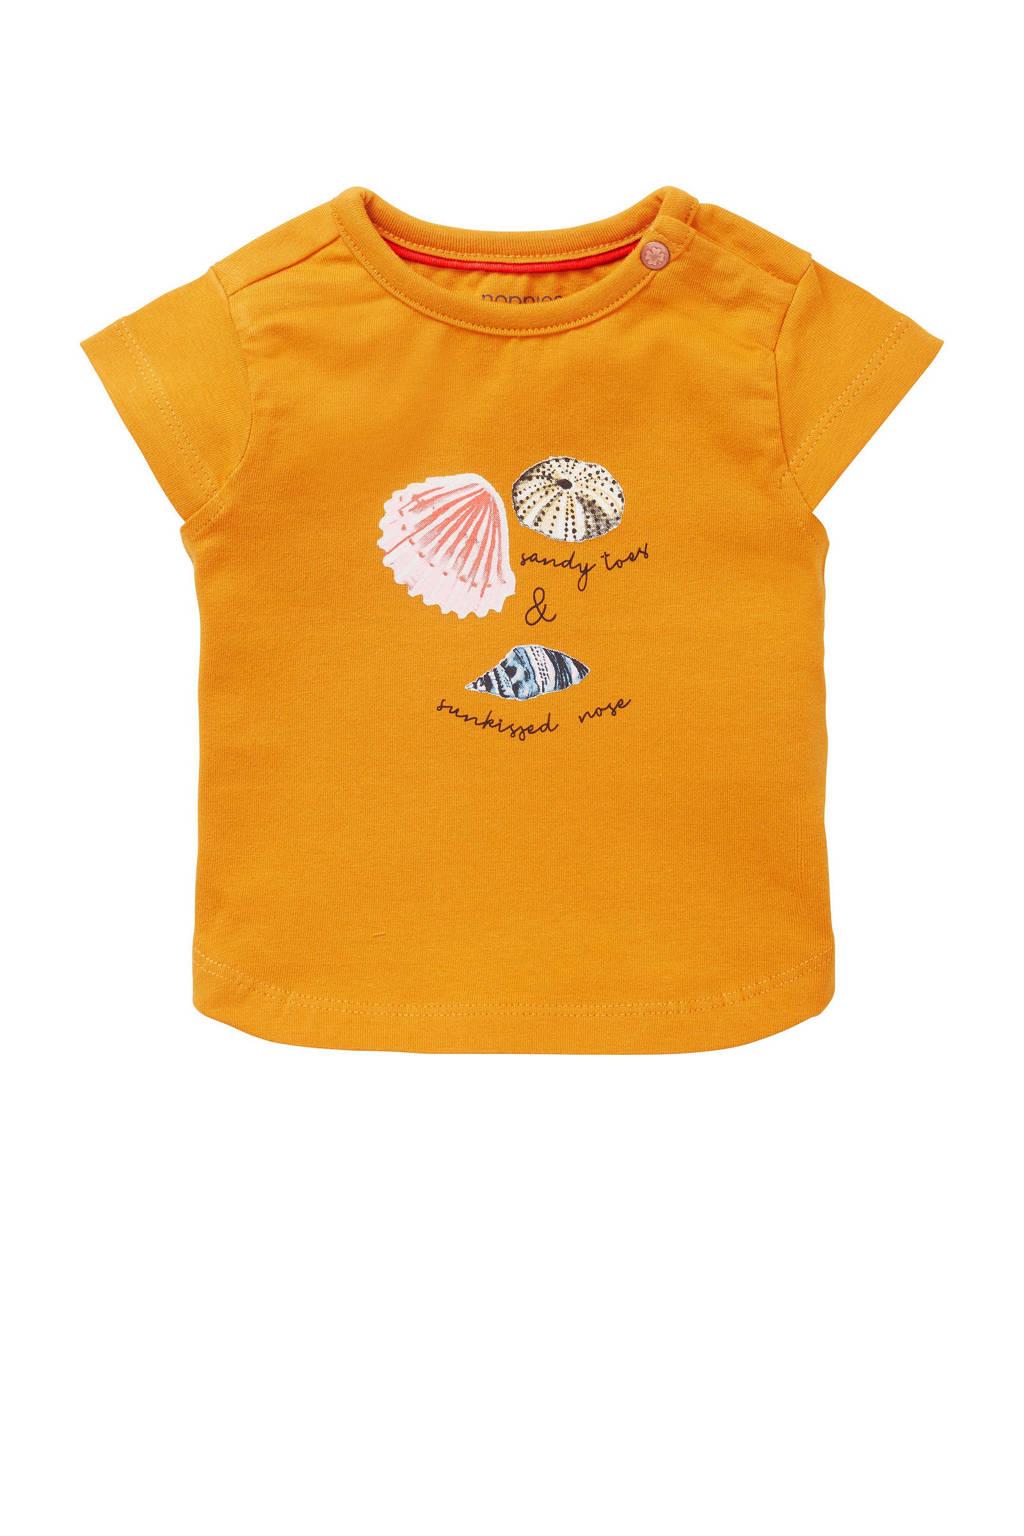 Noppies baby T-shirt Medulla met printopdruk oranje, Oranje